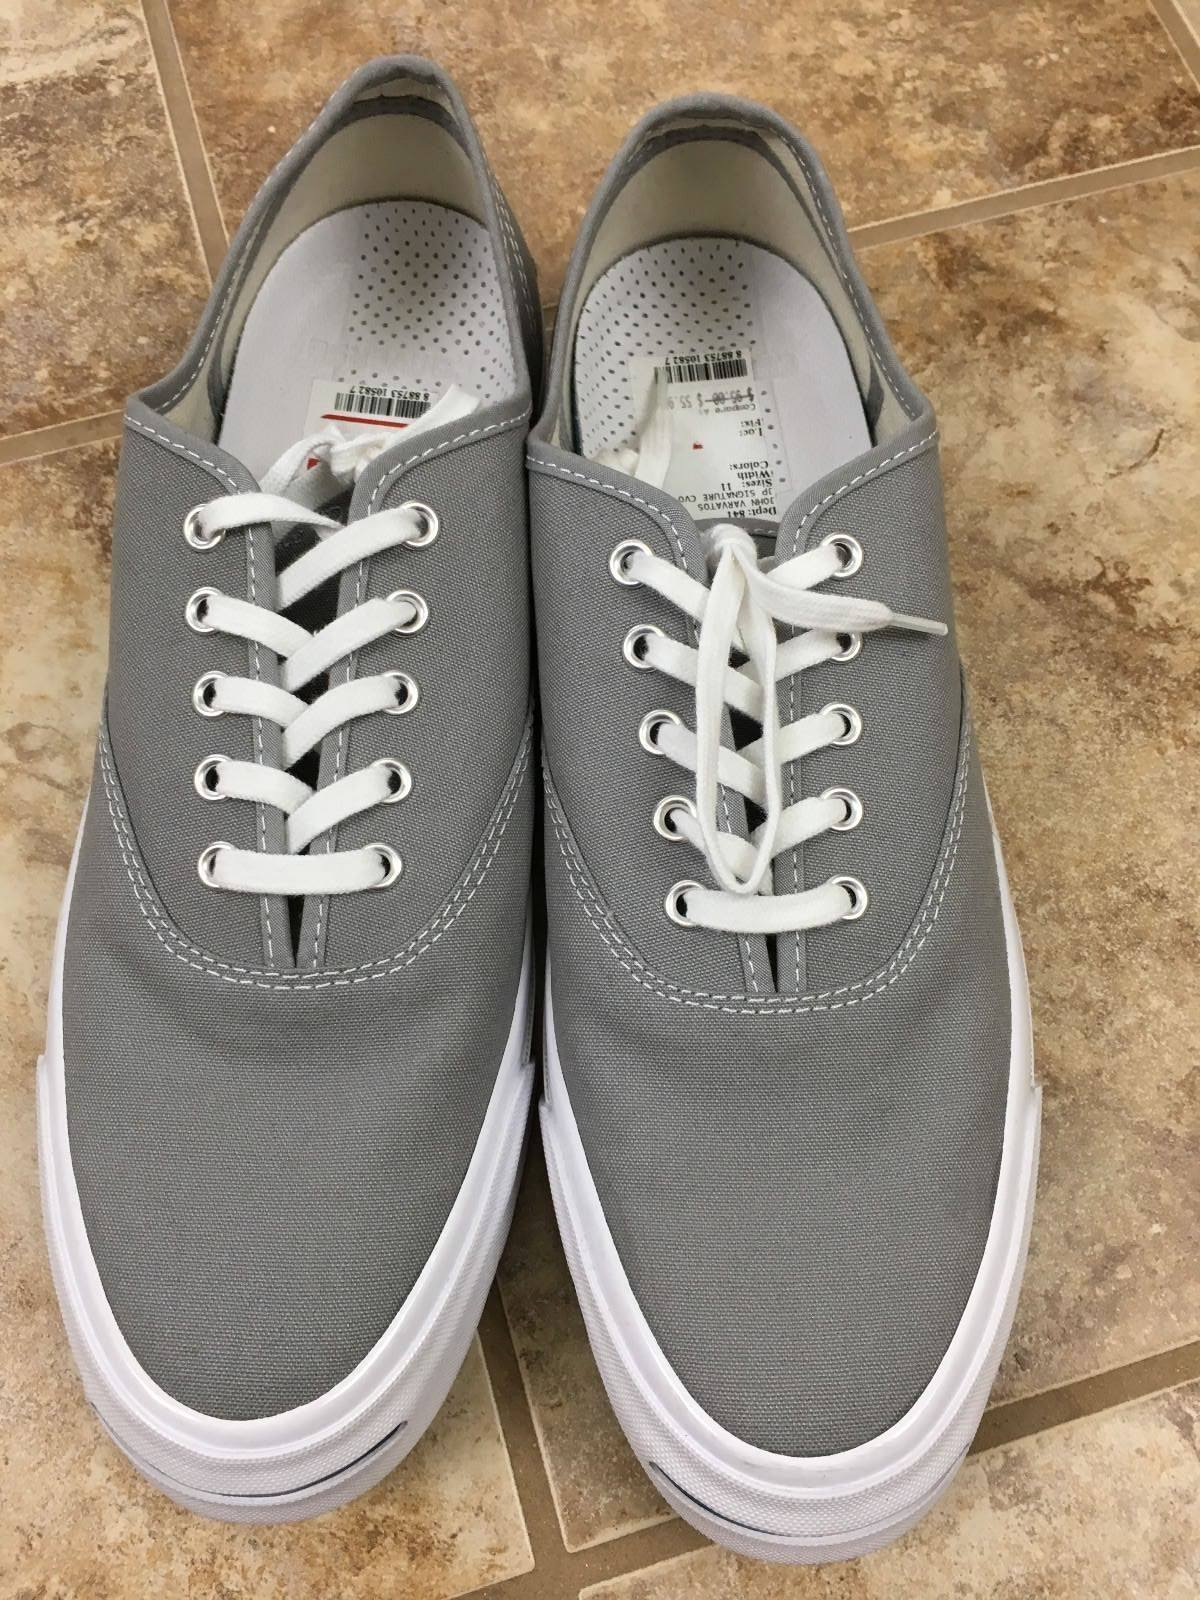 converse shoes jack purcell unique colors without the letter